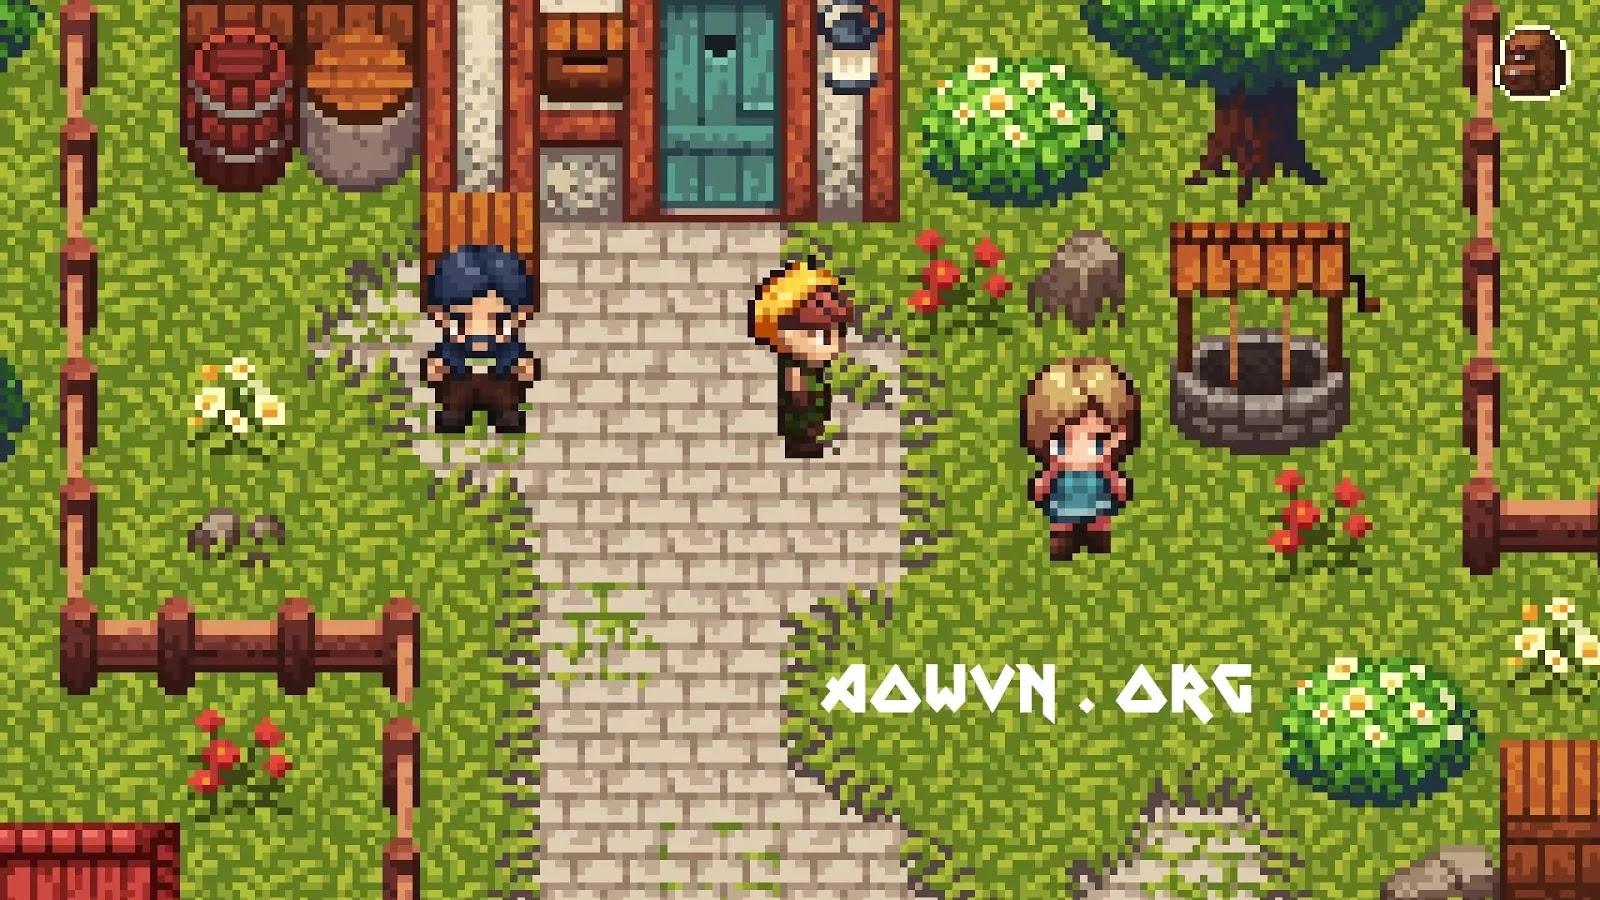 evoland aowvn%2B%25283%2529 - [ PC ] Evoland 1 & 2 | Gói Gọn Lịch Sử Game RPG Trong Một Game